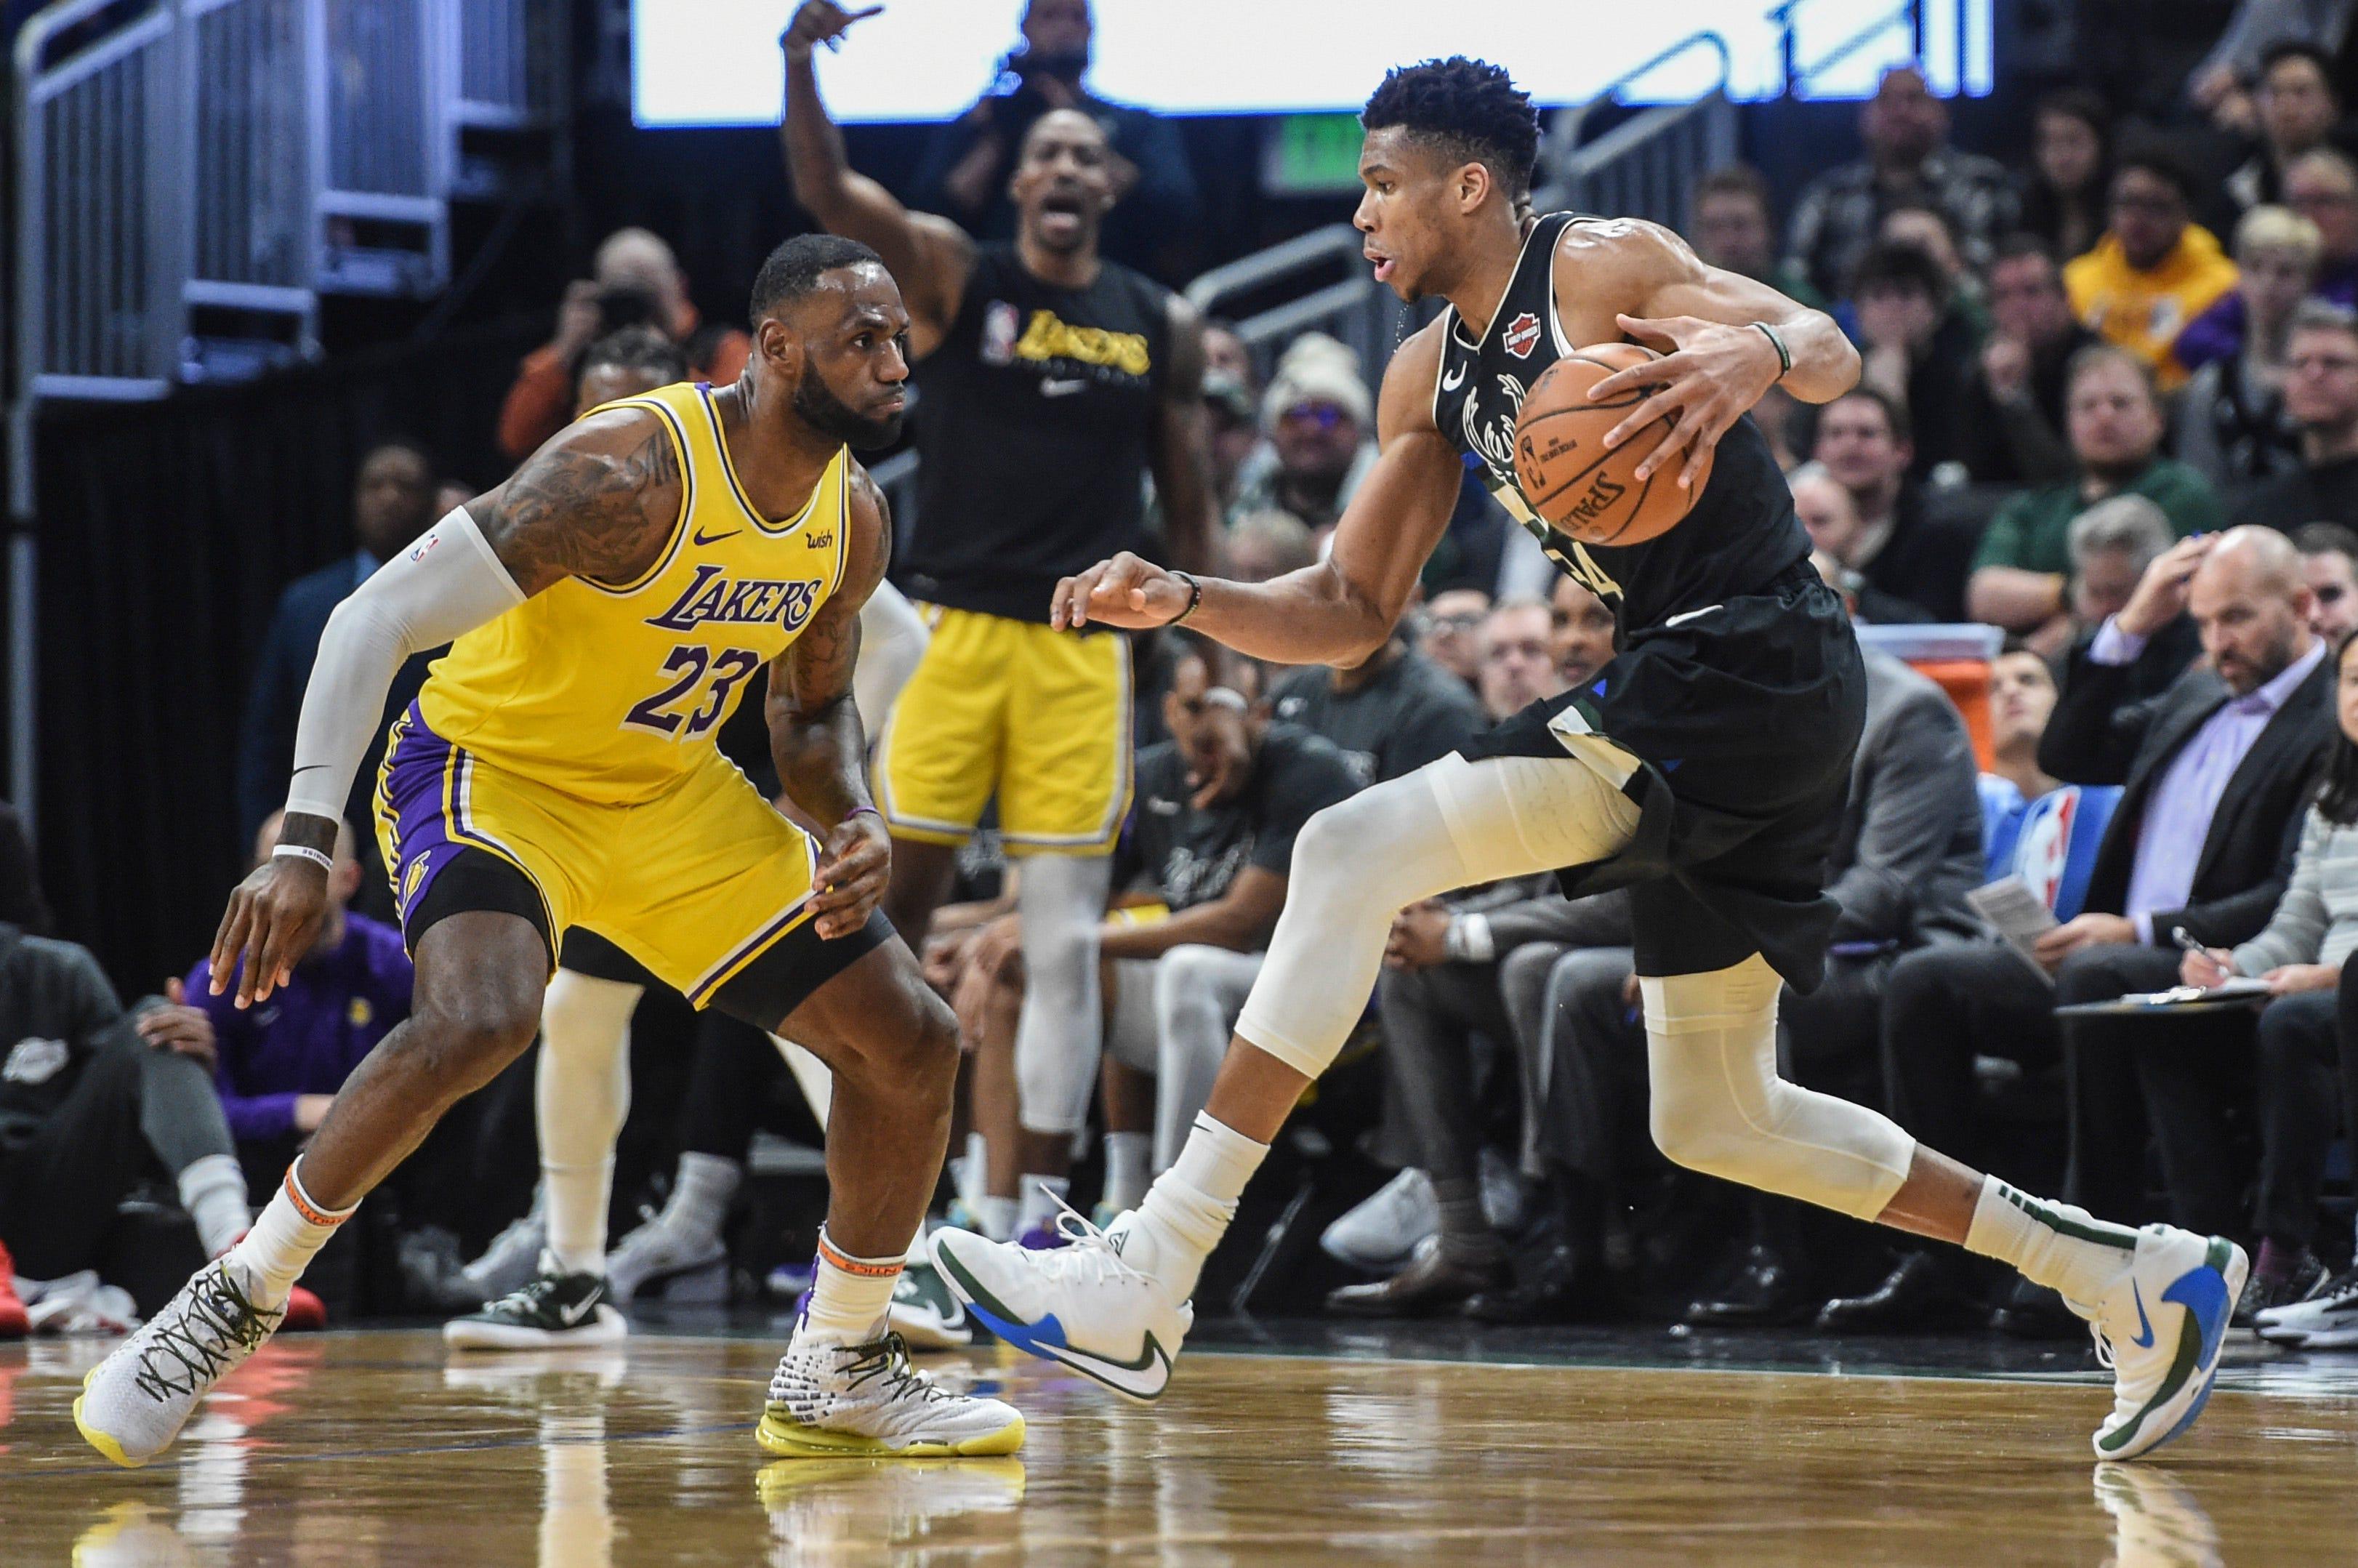 2020 NBA All-Star Game starters